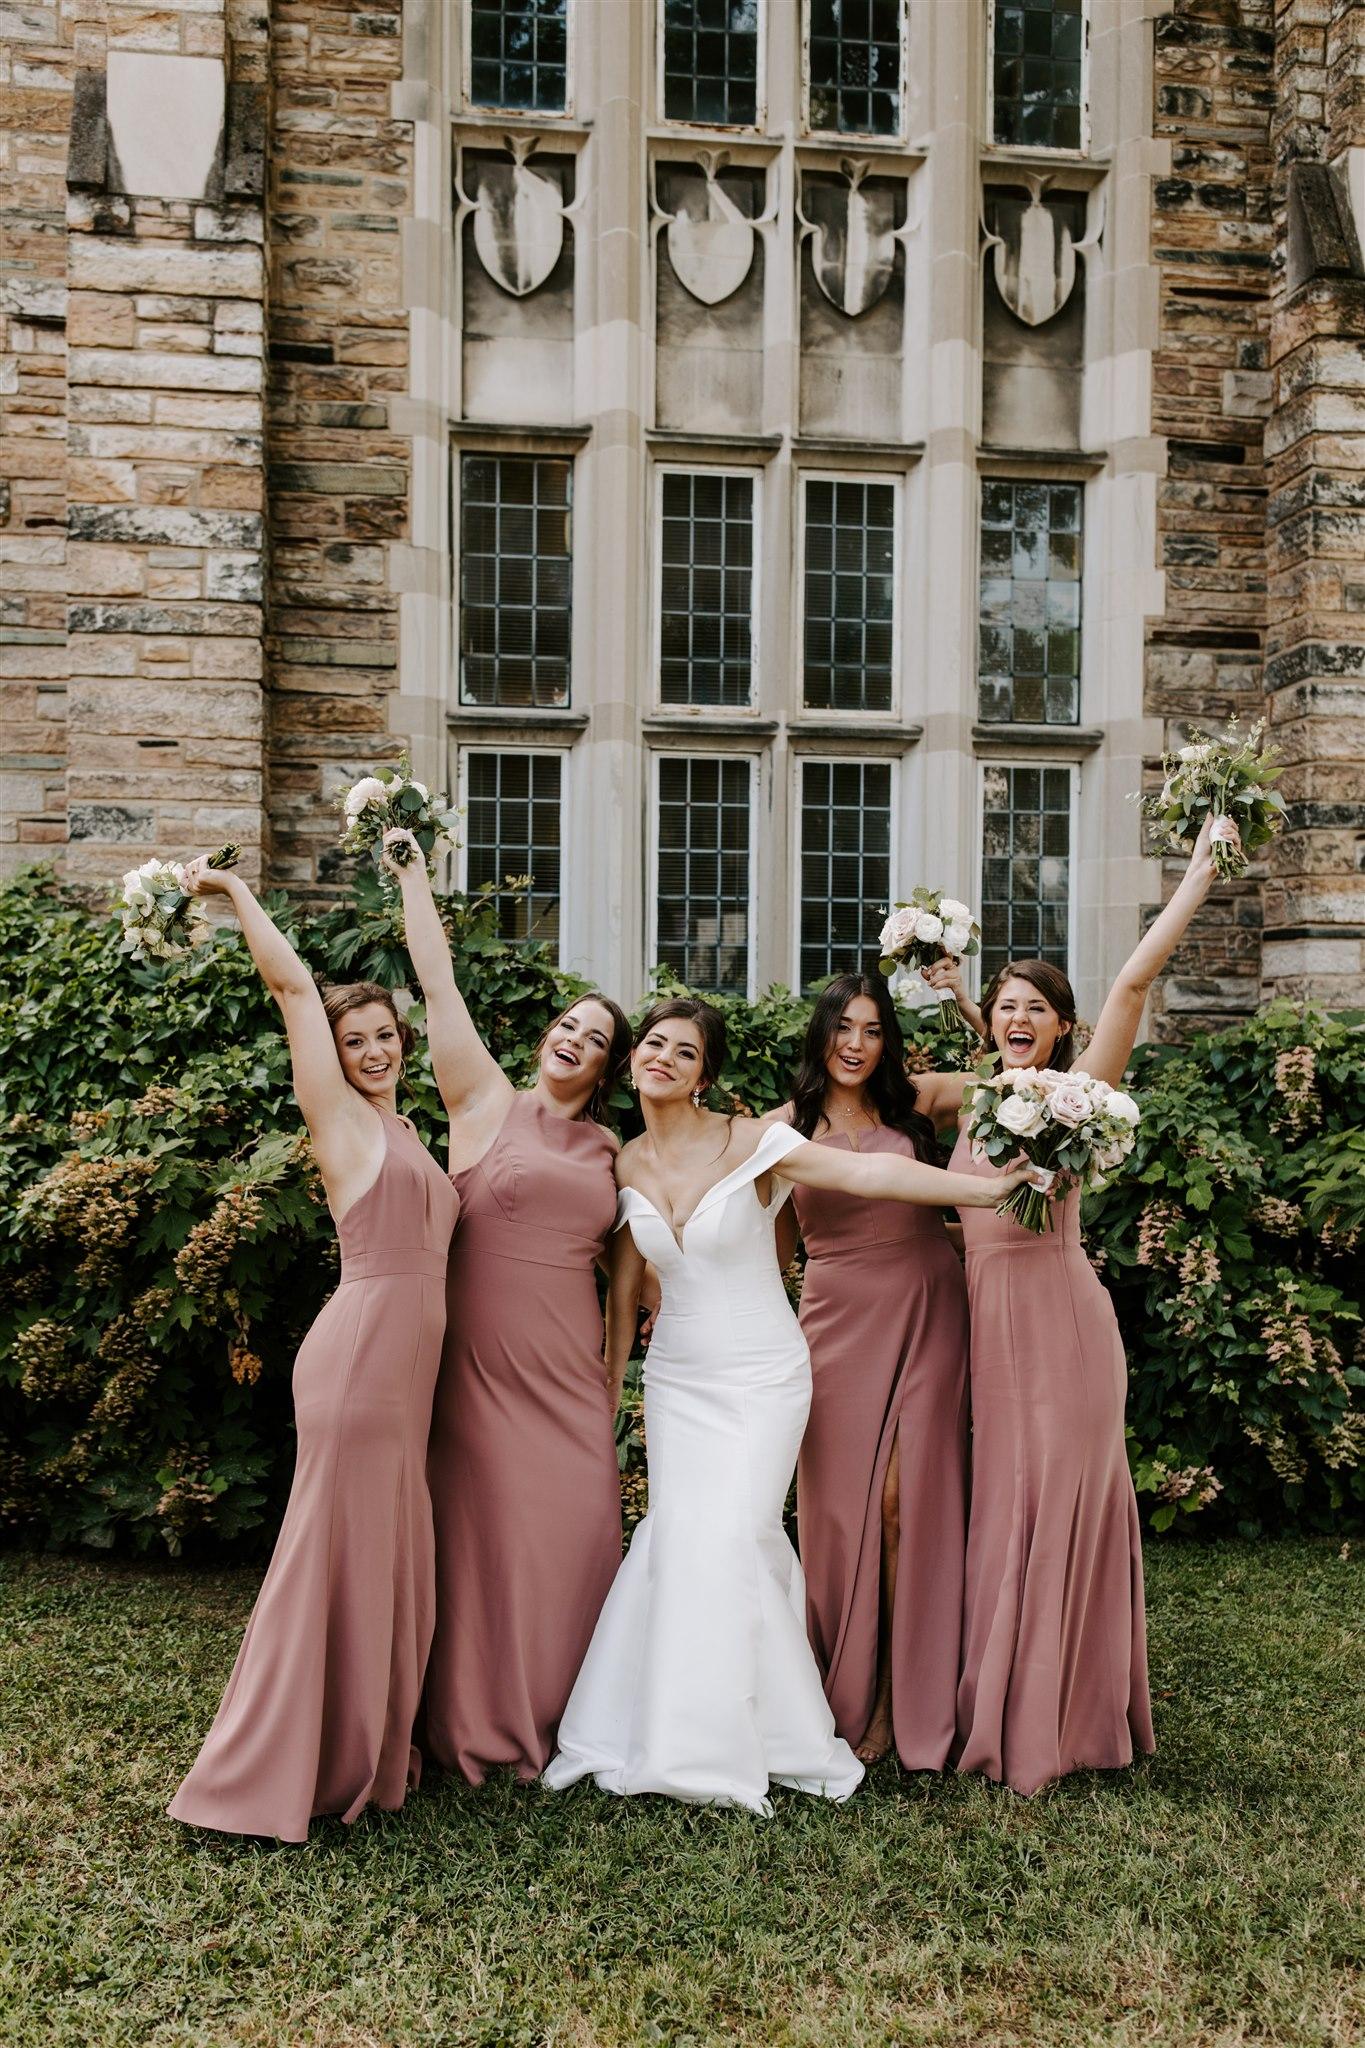 Mauve pink bridesmaids dresses